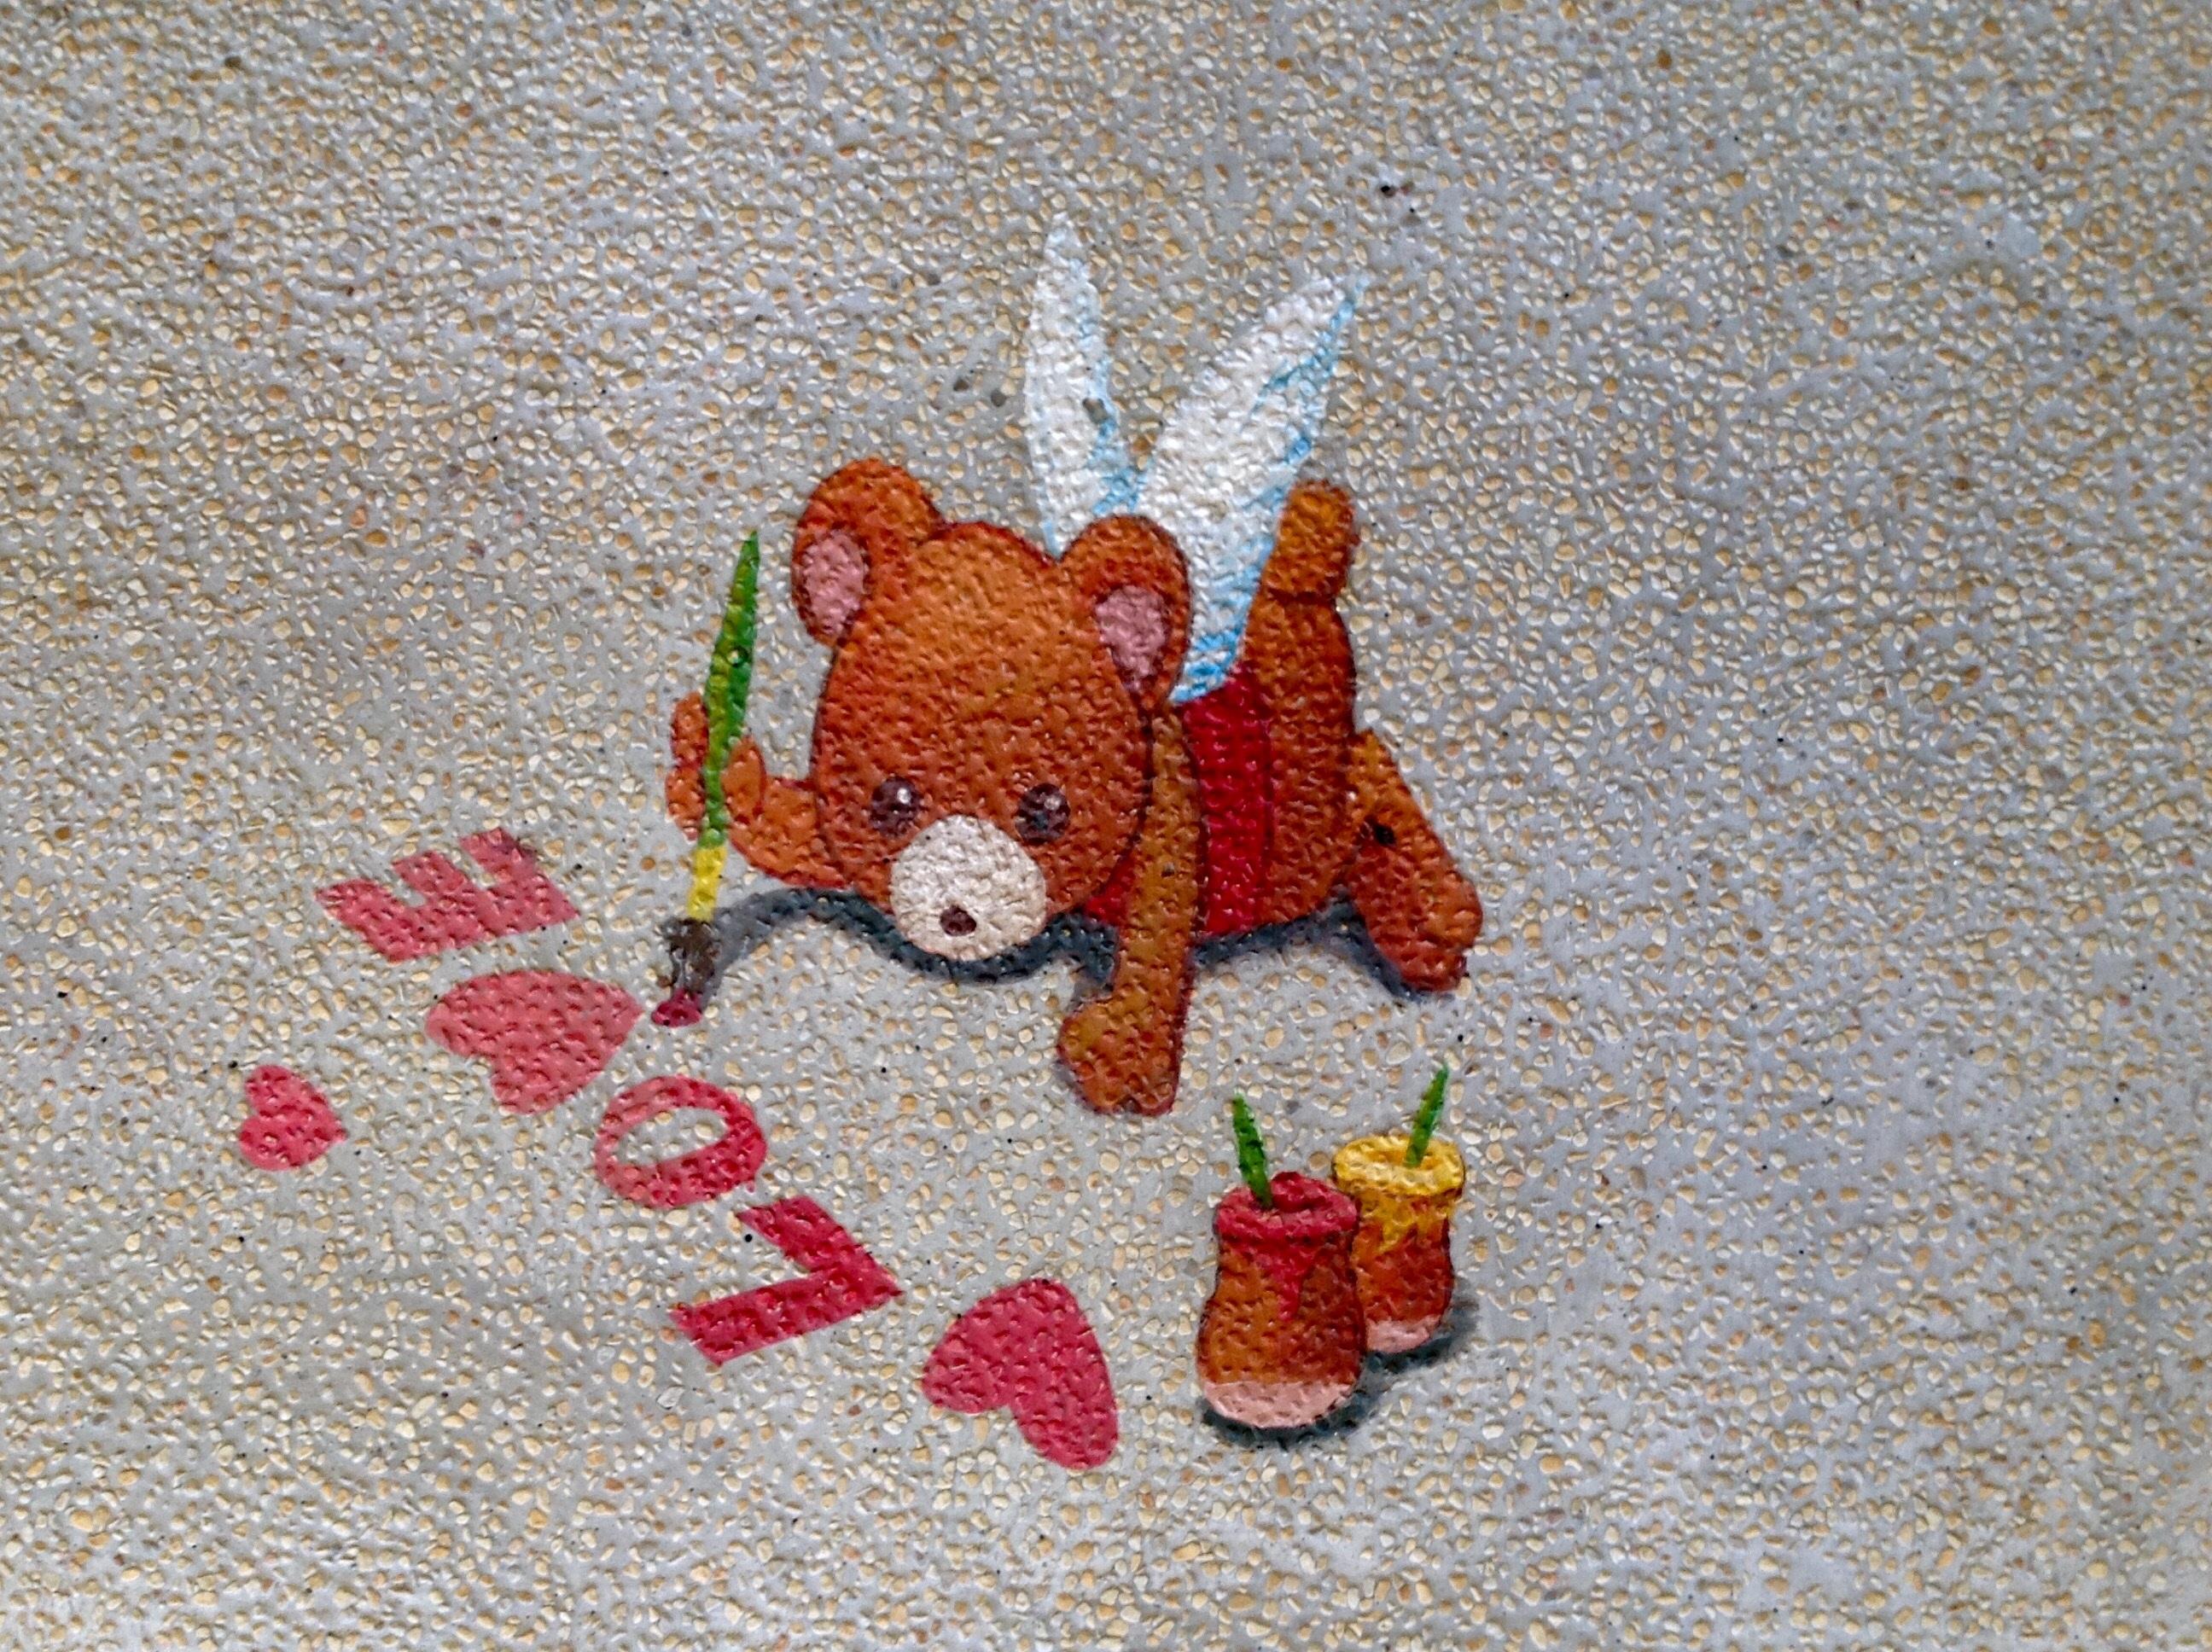 Fotos gratis : pared, amor, patrón, rojo, pintar, juguete, material ...